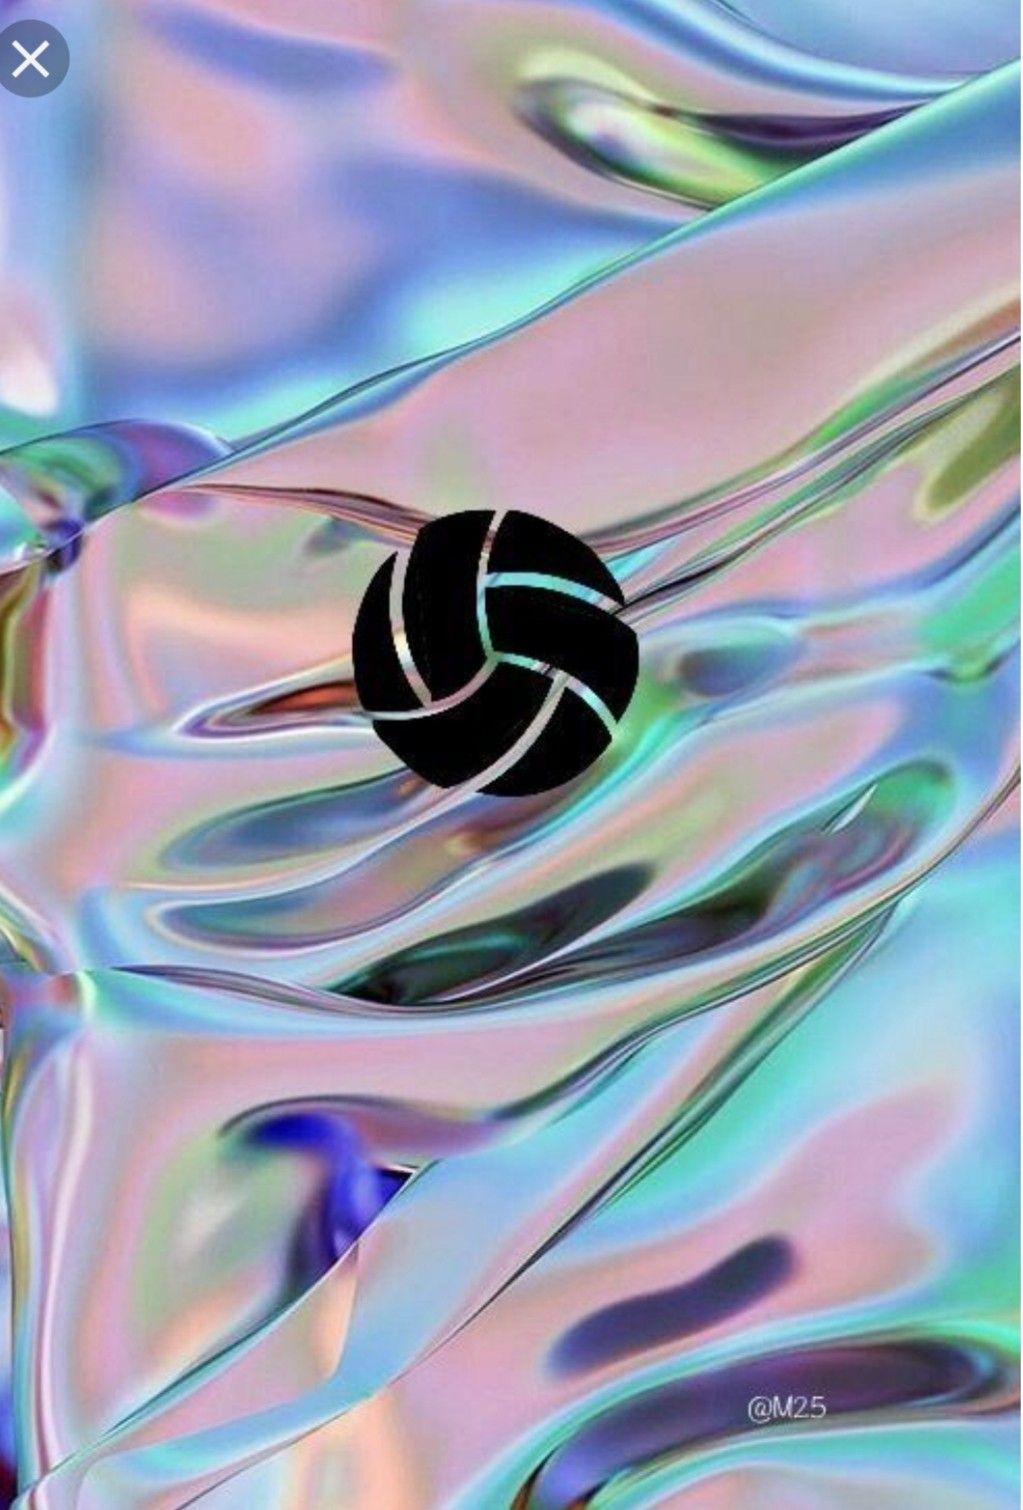 Pin De Johanna Belen En Volleyball Iconos De Instagram Fondos De Pantalla De Iphone Fondos De Instagram